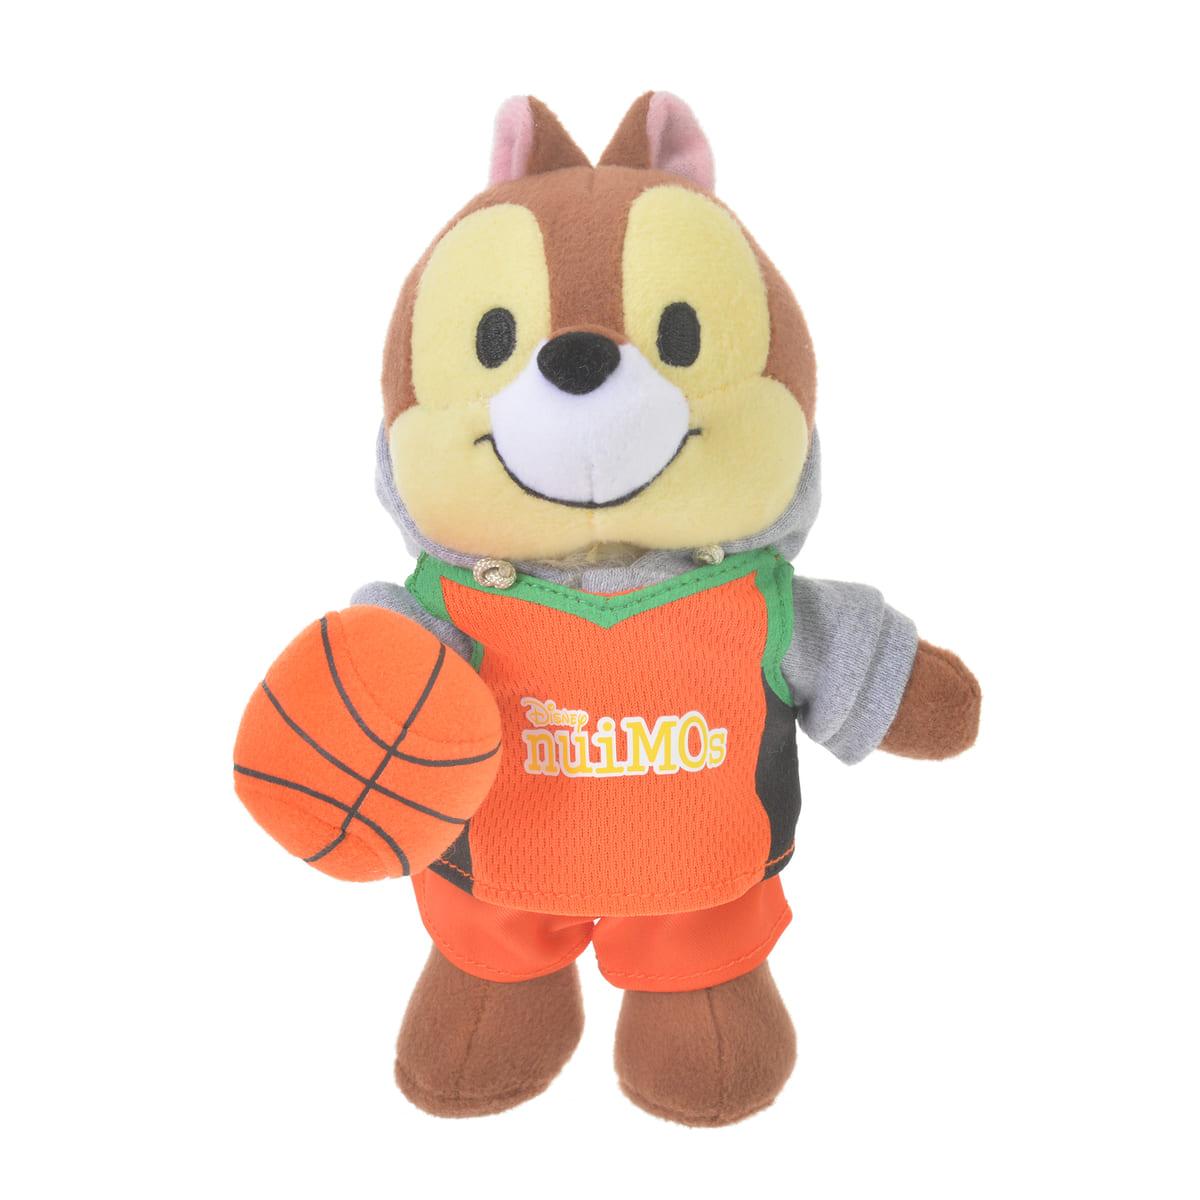 nuiMOs ぬいぐるみ専用コスチューム バスケットボールユニフォームセット ブルー